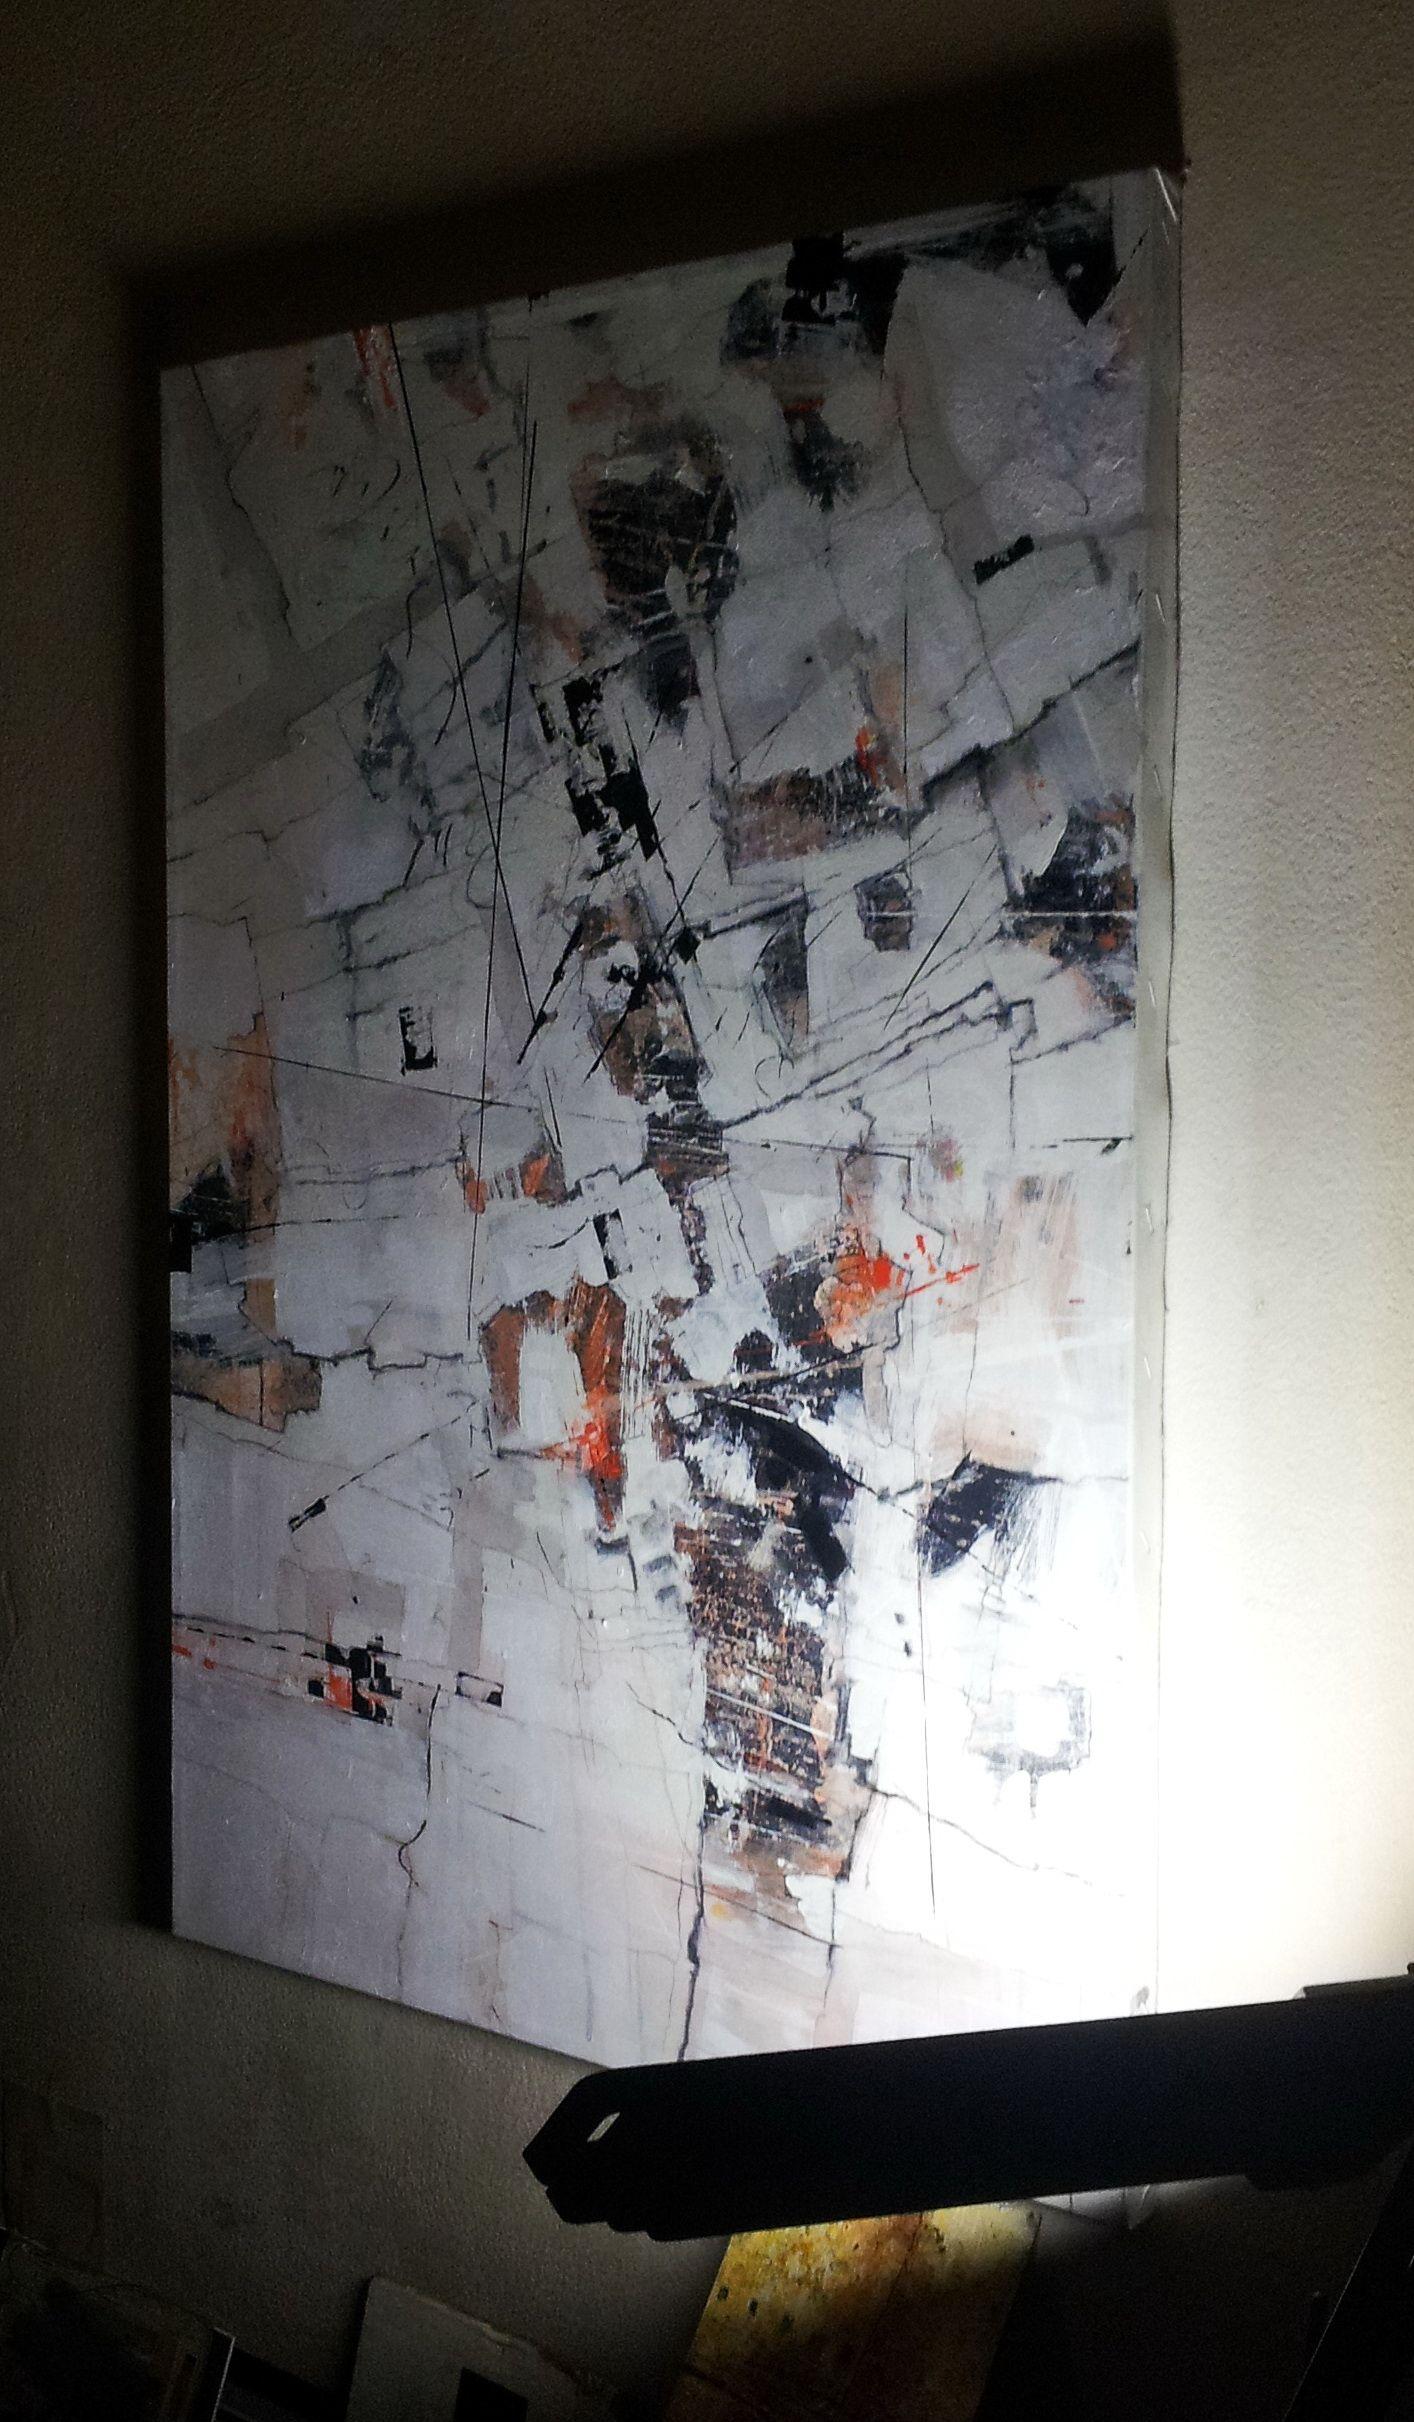 Pencil, Acrylic, Oil On Canvas, 70X50Cm By Marko Davidovic, 2017